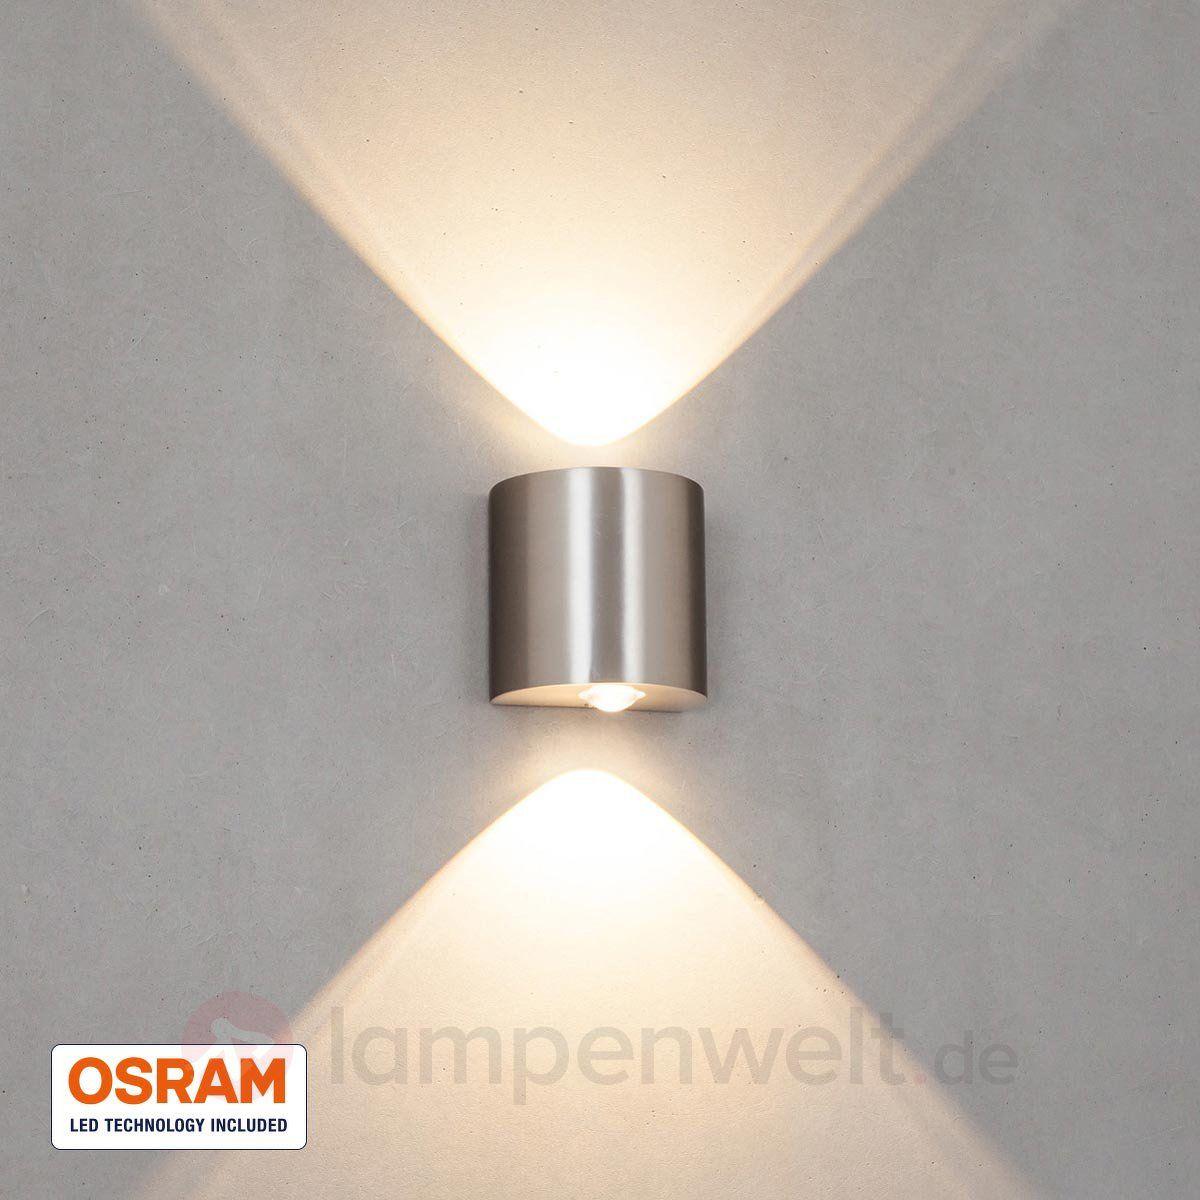 Moderne Led Wandleuchte Dilara Mit Osram Leds Sicher Bequem Online Bestellen Bei Lampenwelt De Moderne Lampen Beleuchtungsideen Wandleuchte